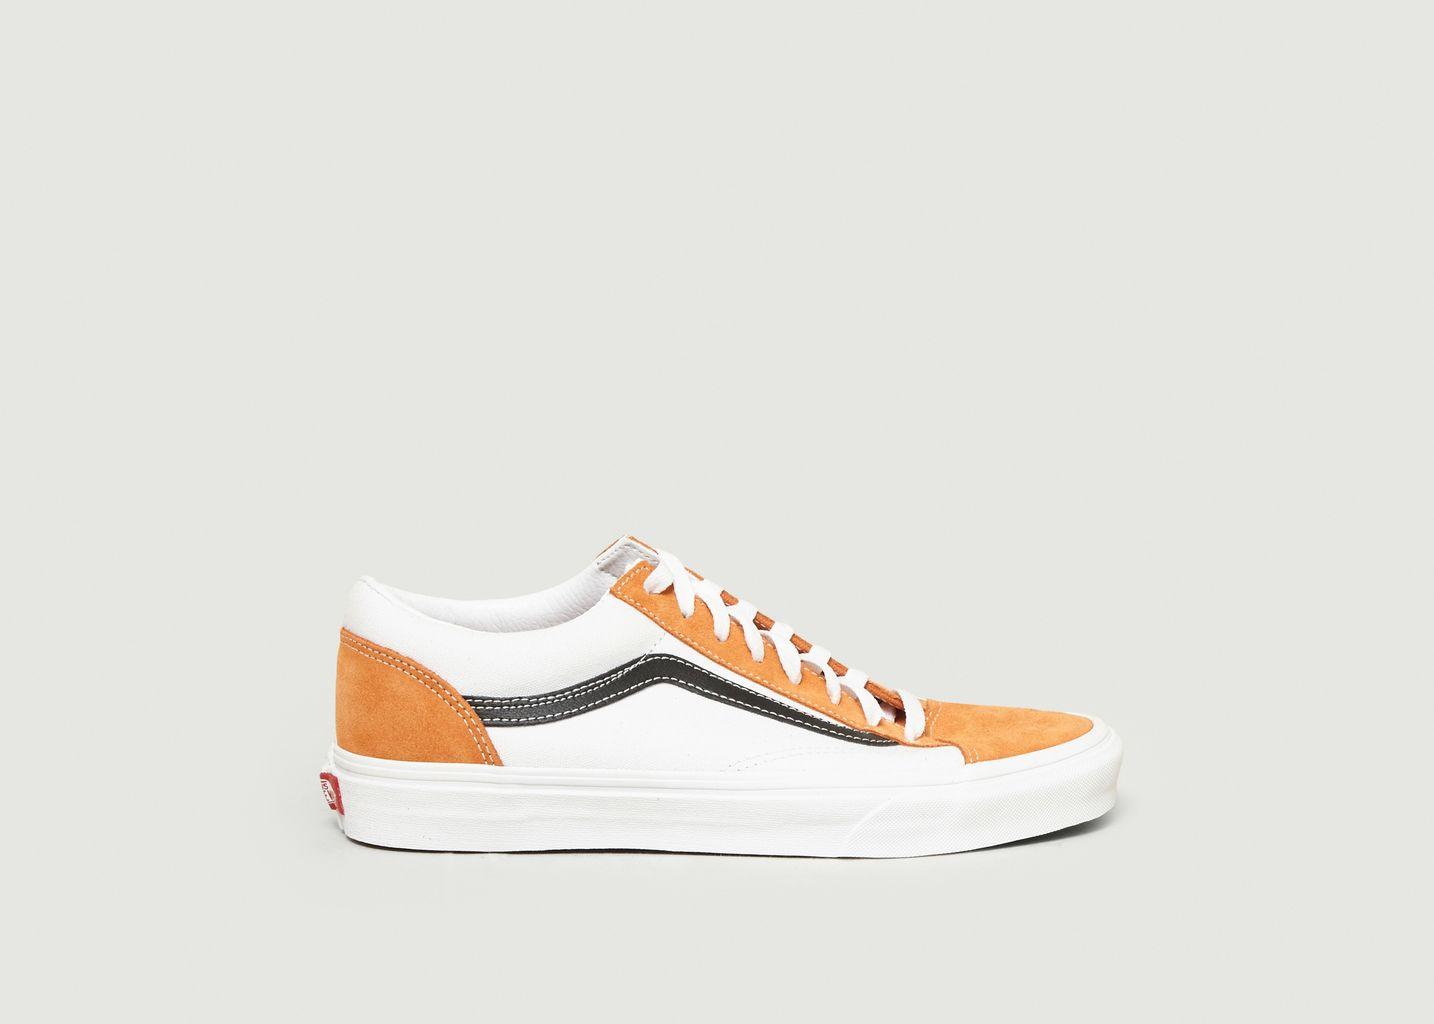 Sneakers Retro Sport Style 36 - Vans